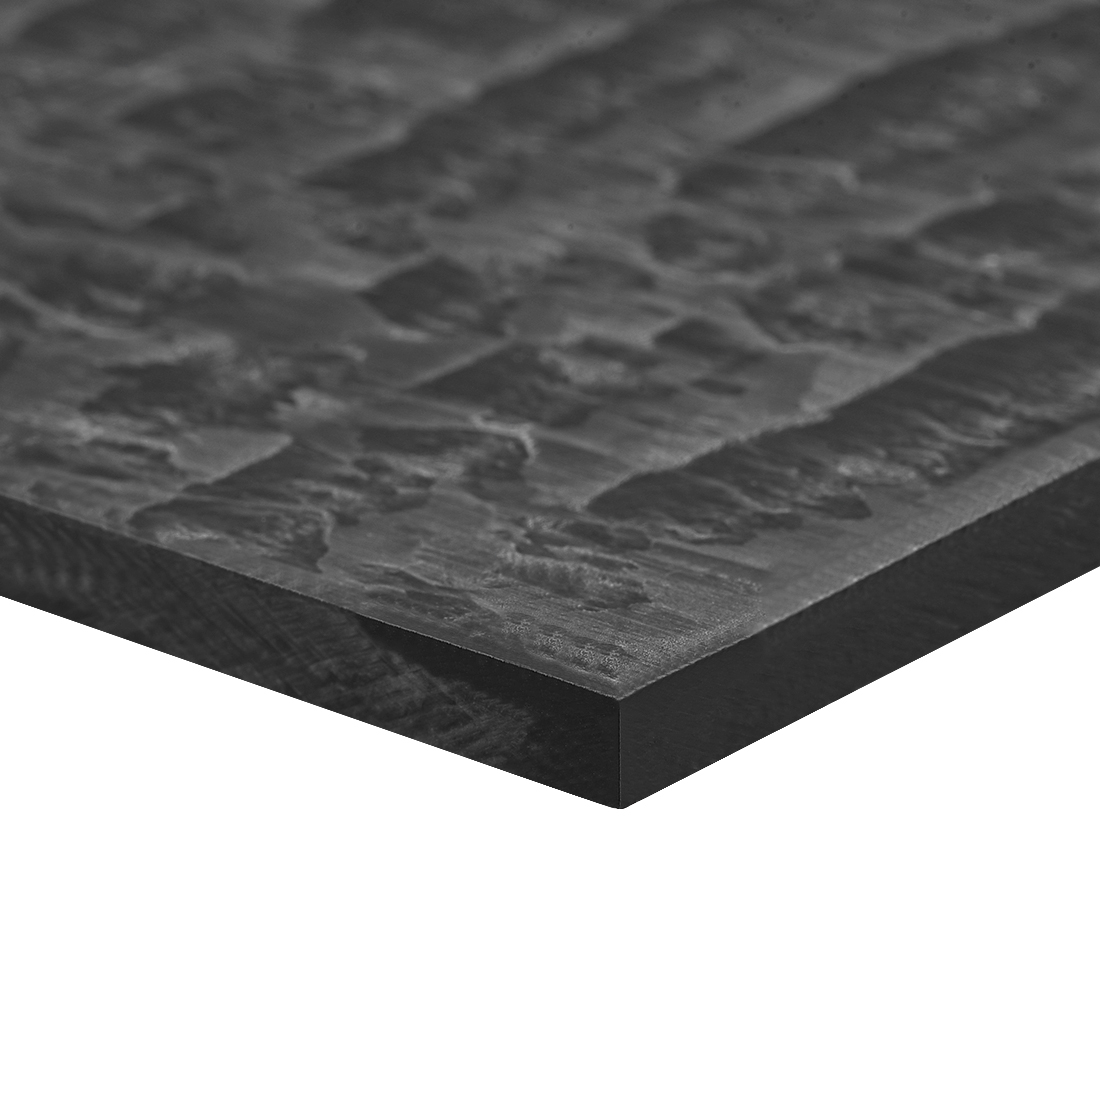 Acetal POM Sheet Polyoxymethylene Plate Sheet 150 x 200 x 5mm Black 2 Pcs